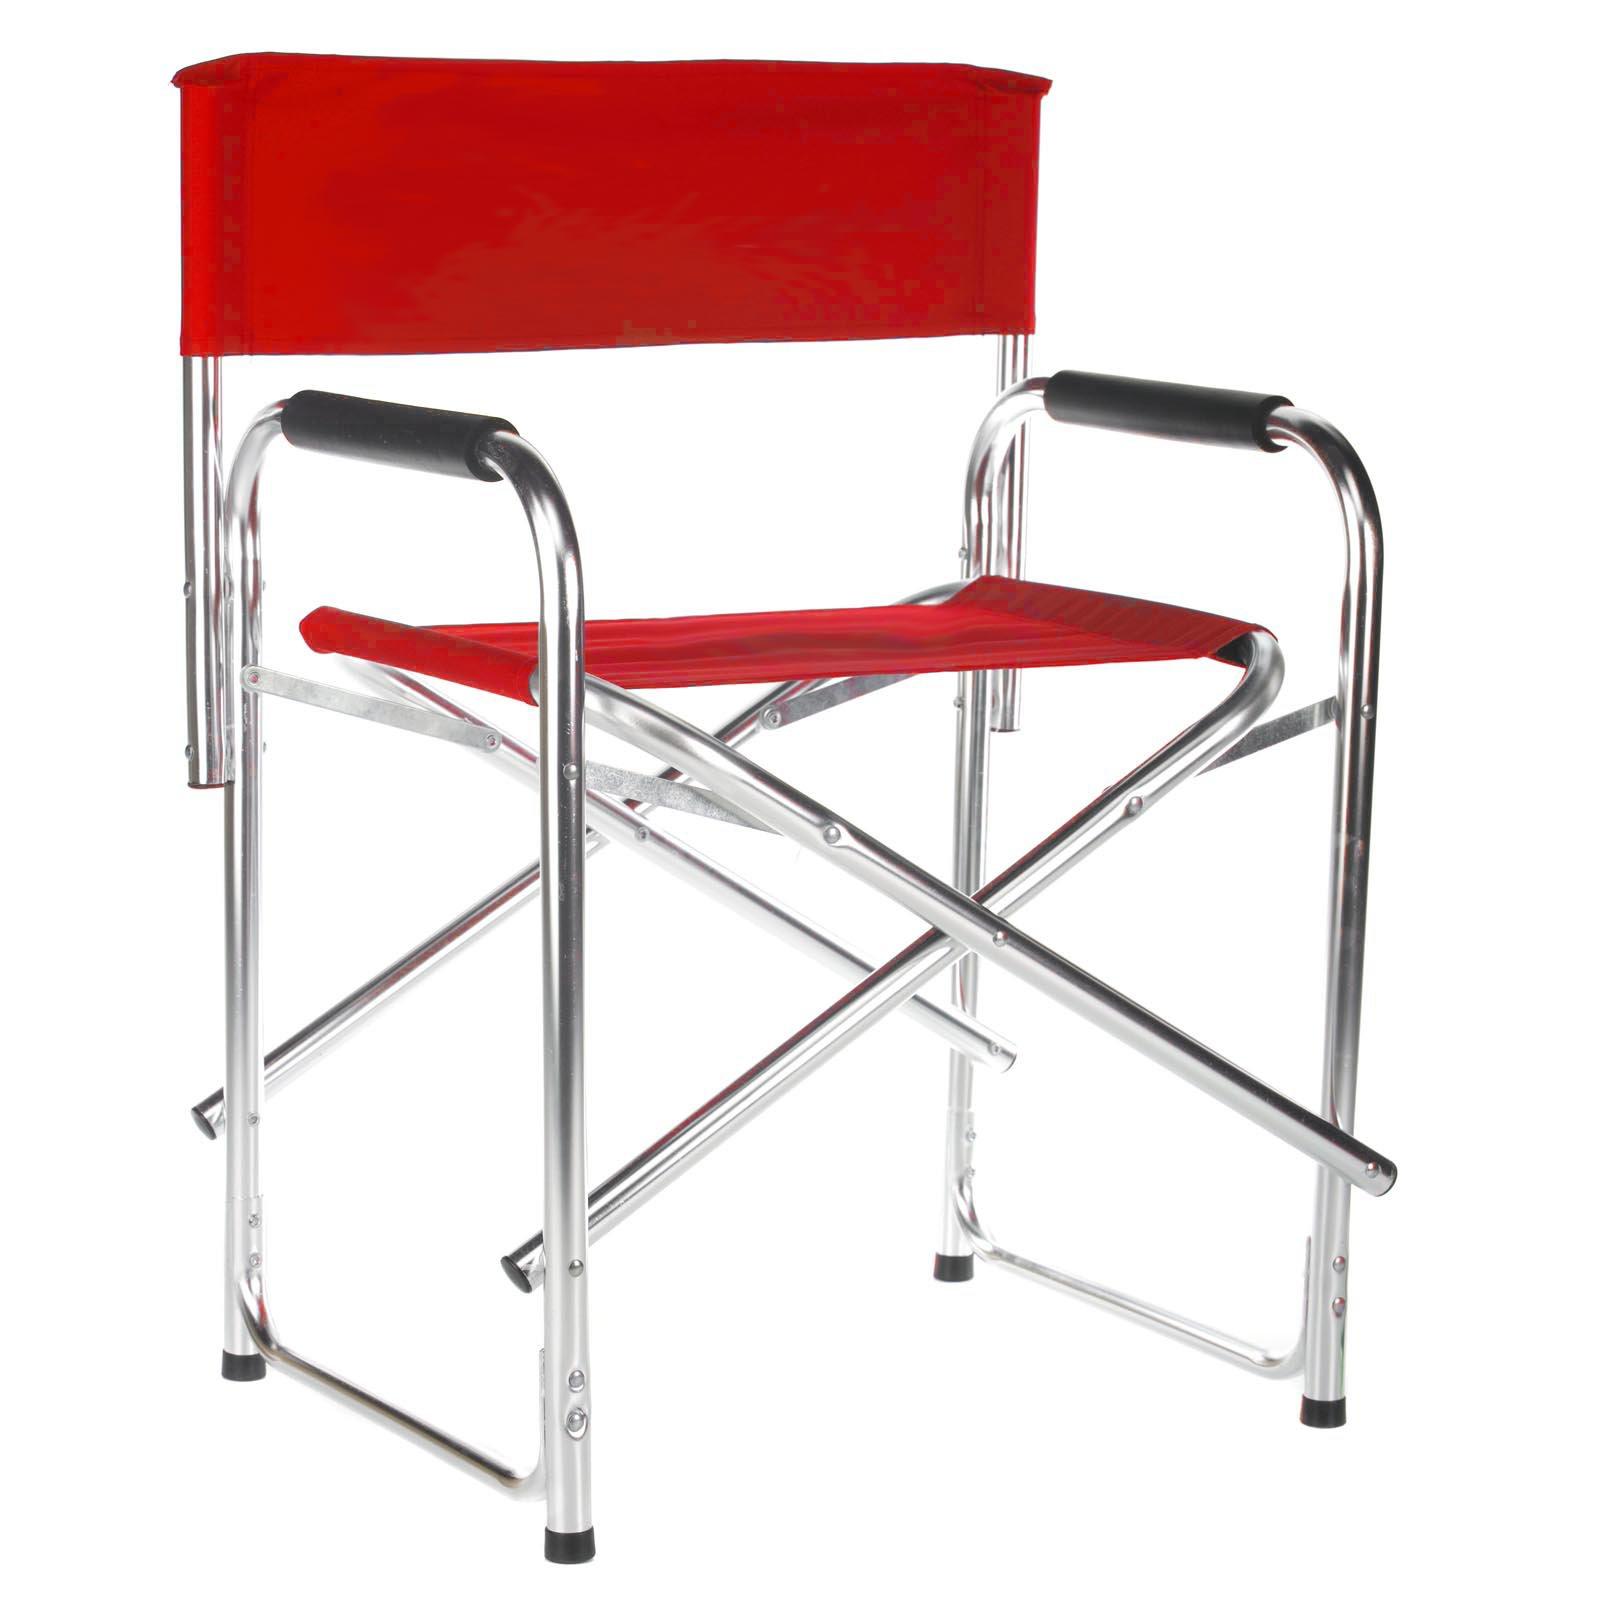 18 Inch Deluxe Aluminum Frame Standard Height Directors Chair